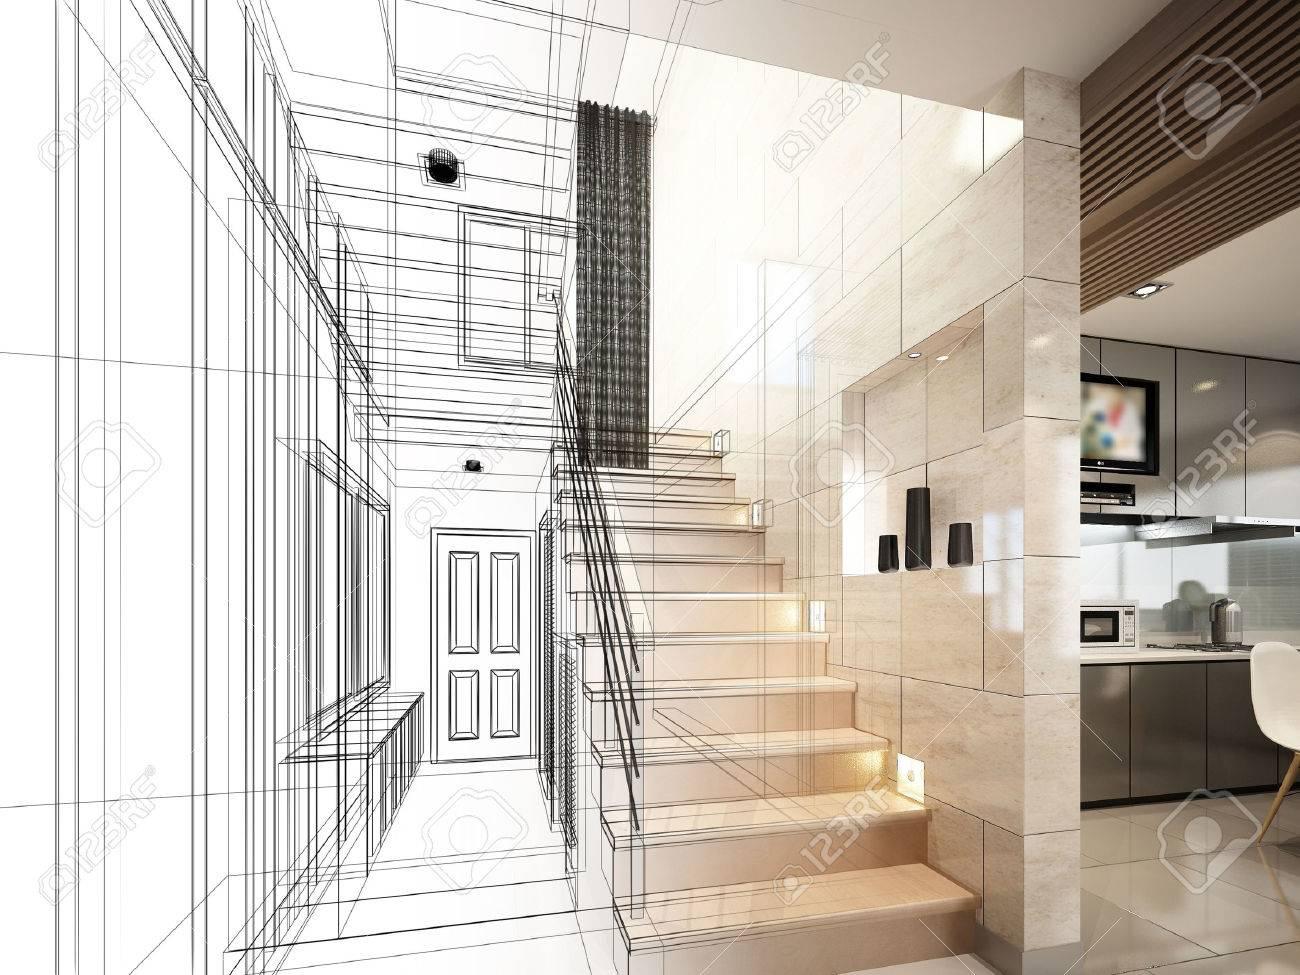 sketch design of stair hall 3dwire frame render - 40904841